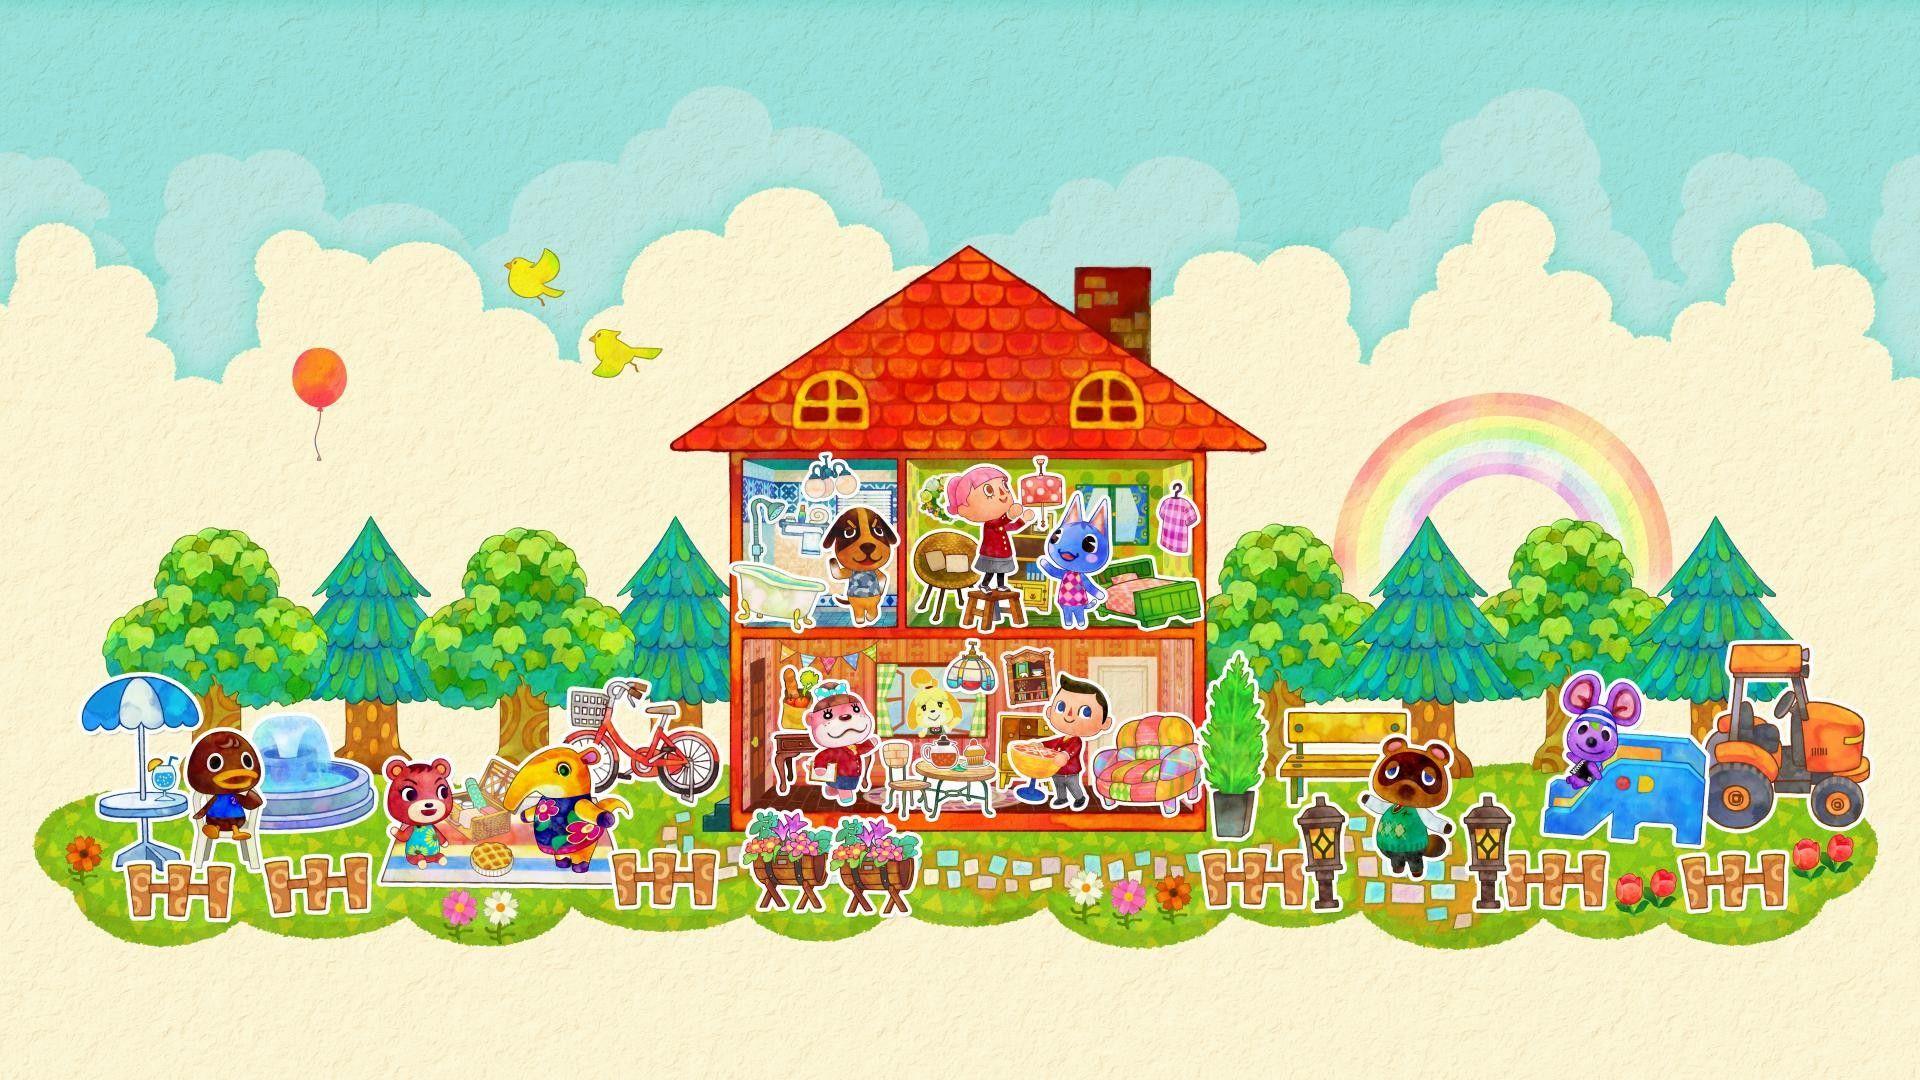 Animal Crossing Wallpaper Hd Animal Crossing Happy Home Designer Minimalist Animal